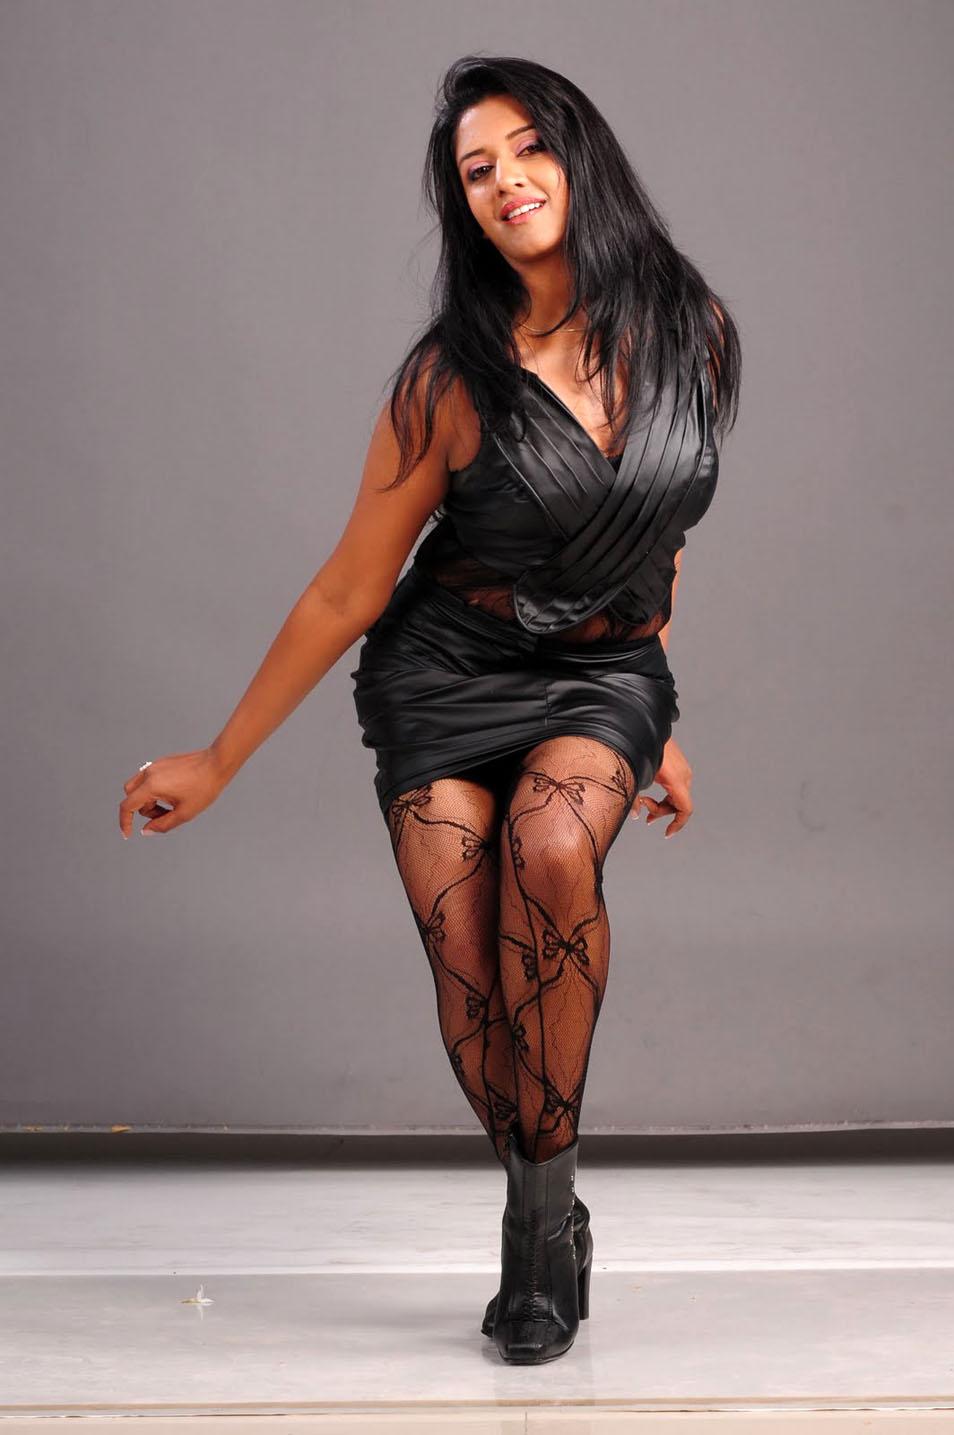 Vimala Raman Hot Photos www.moovstills.com